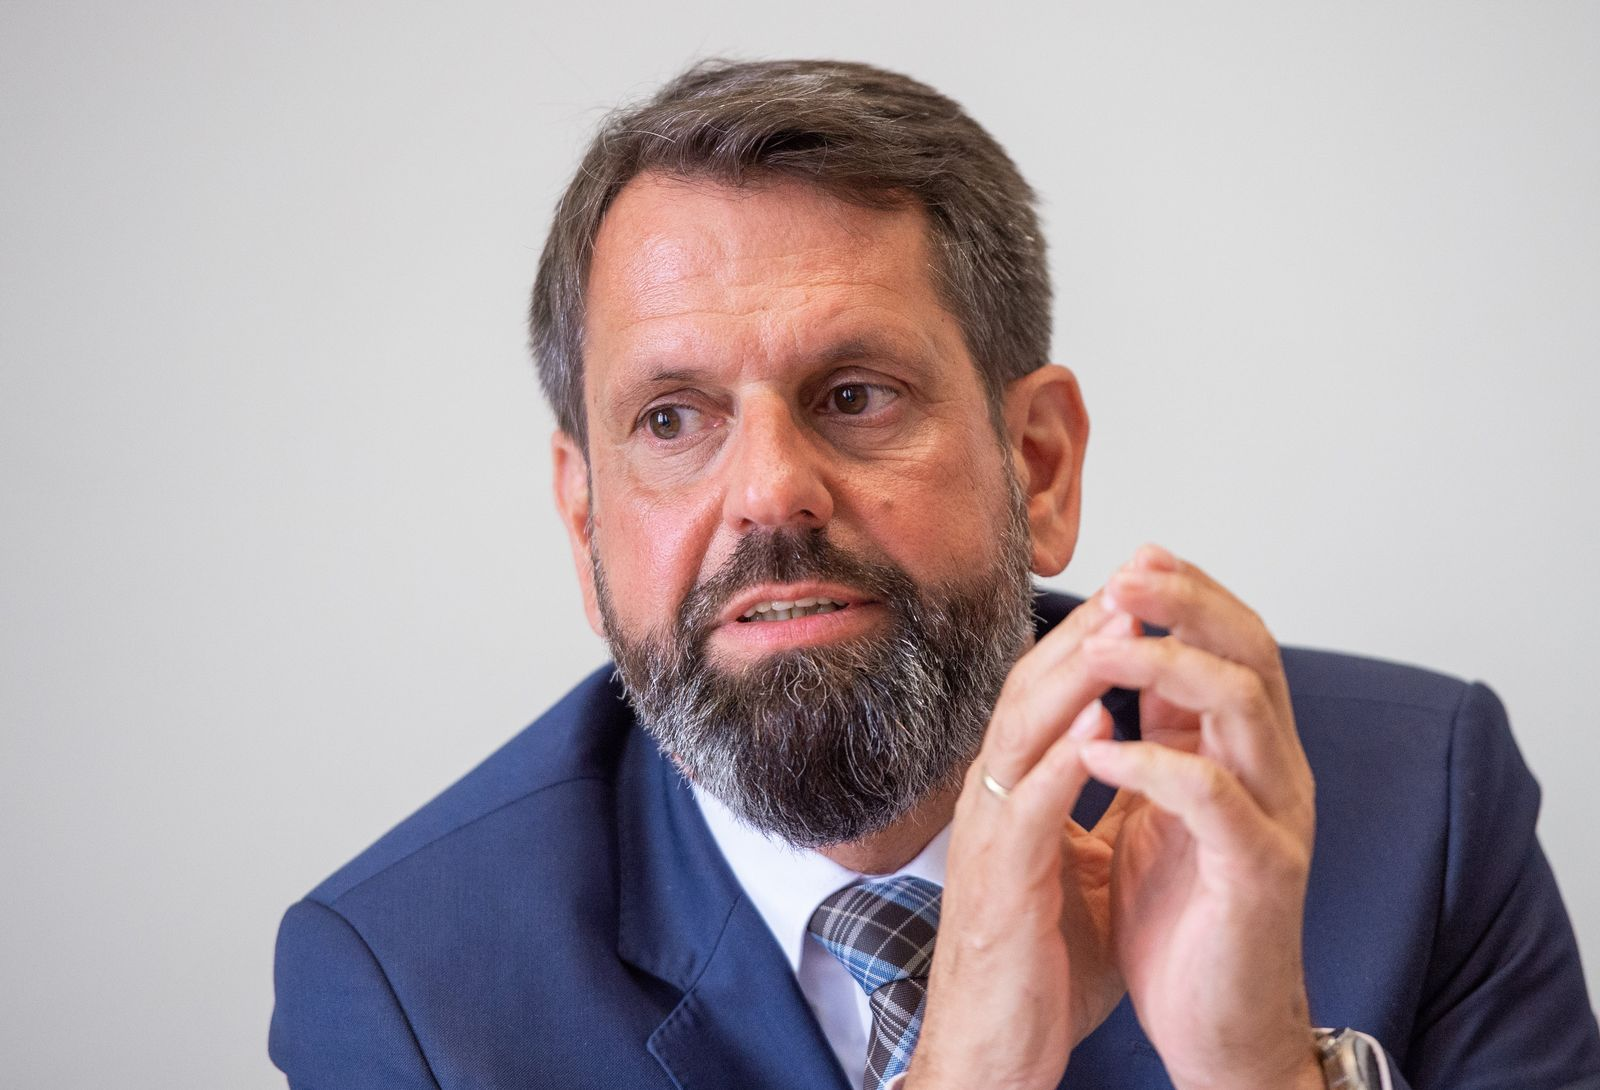 Niedersachsens Umweltminister Olaf Lies